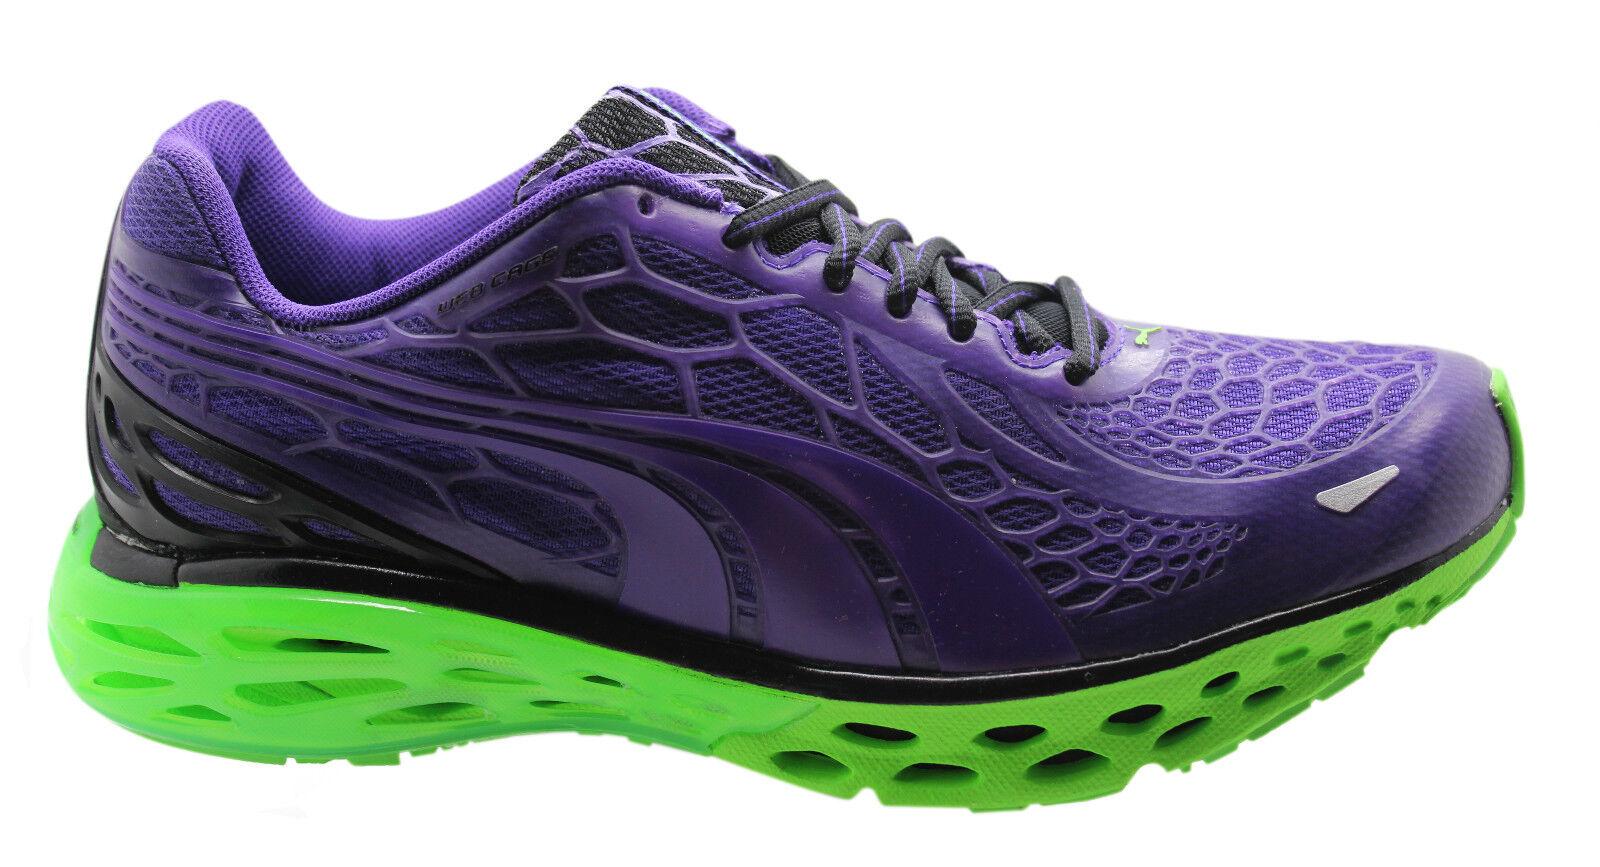 Puma Bioweb Elite NM Zapatillas Running para Hombre Fitness púrpura 186903 02 D53